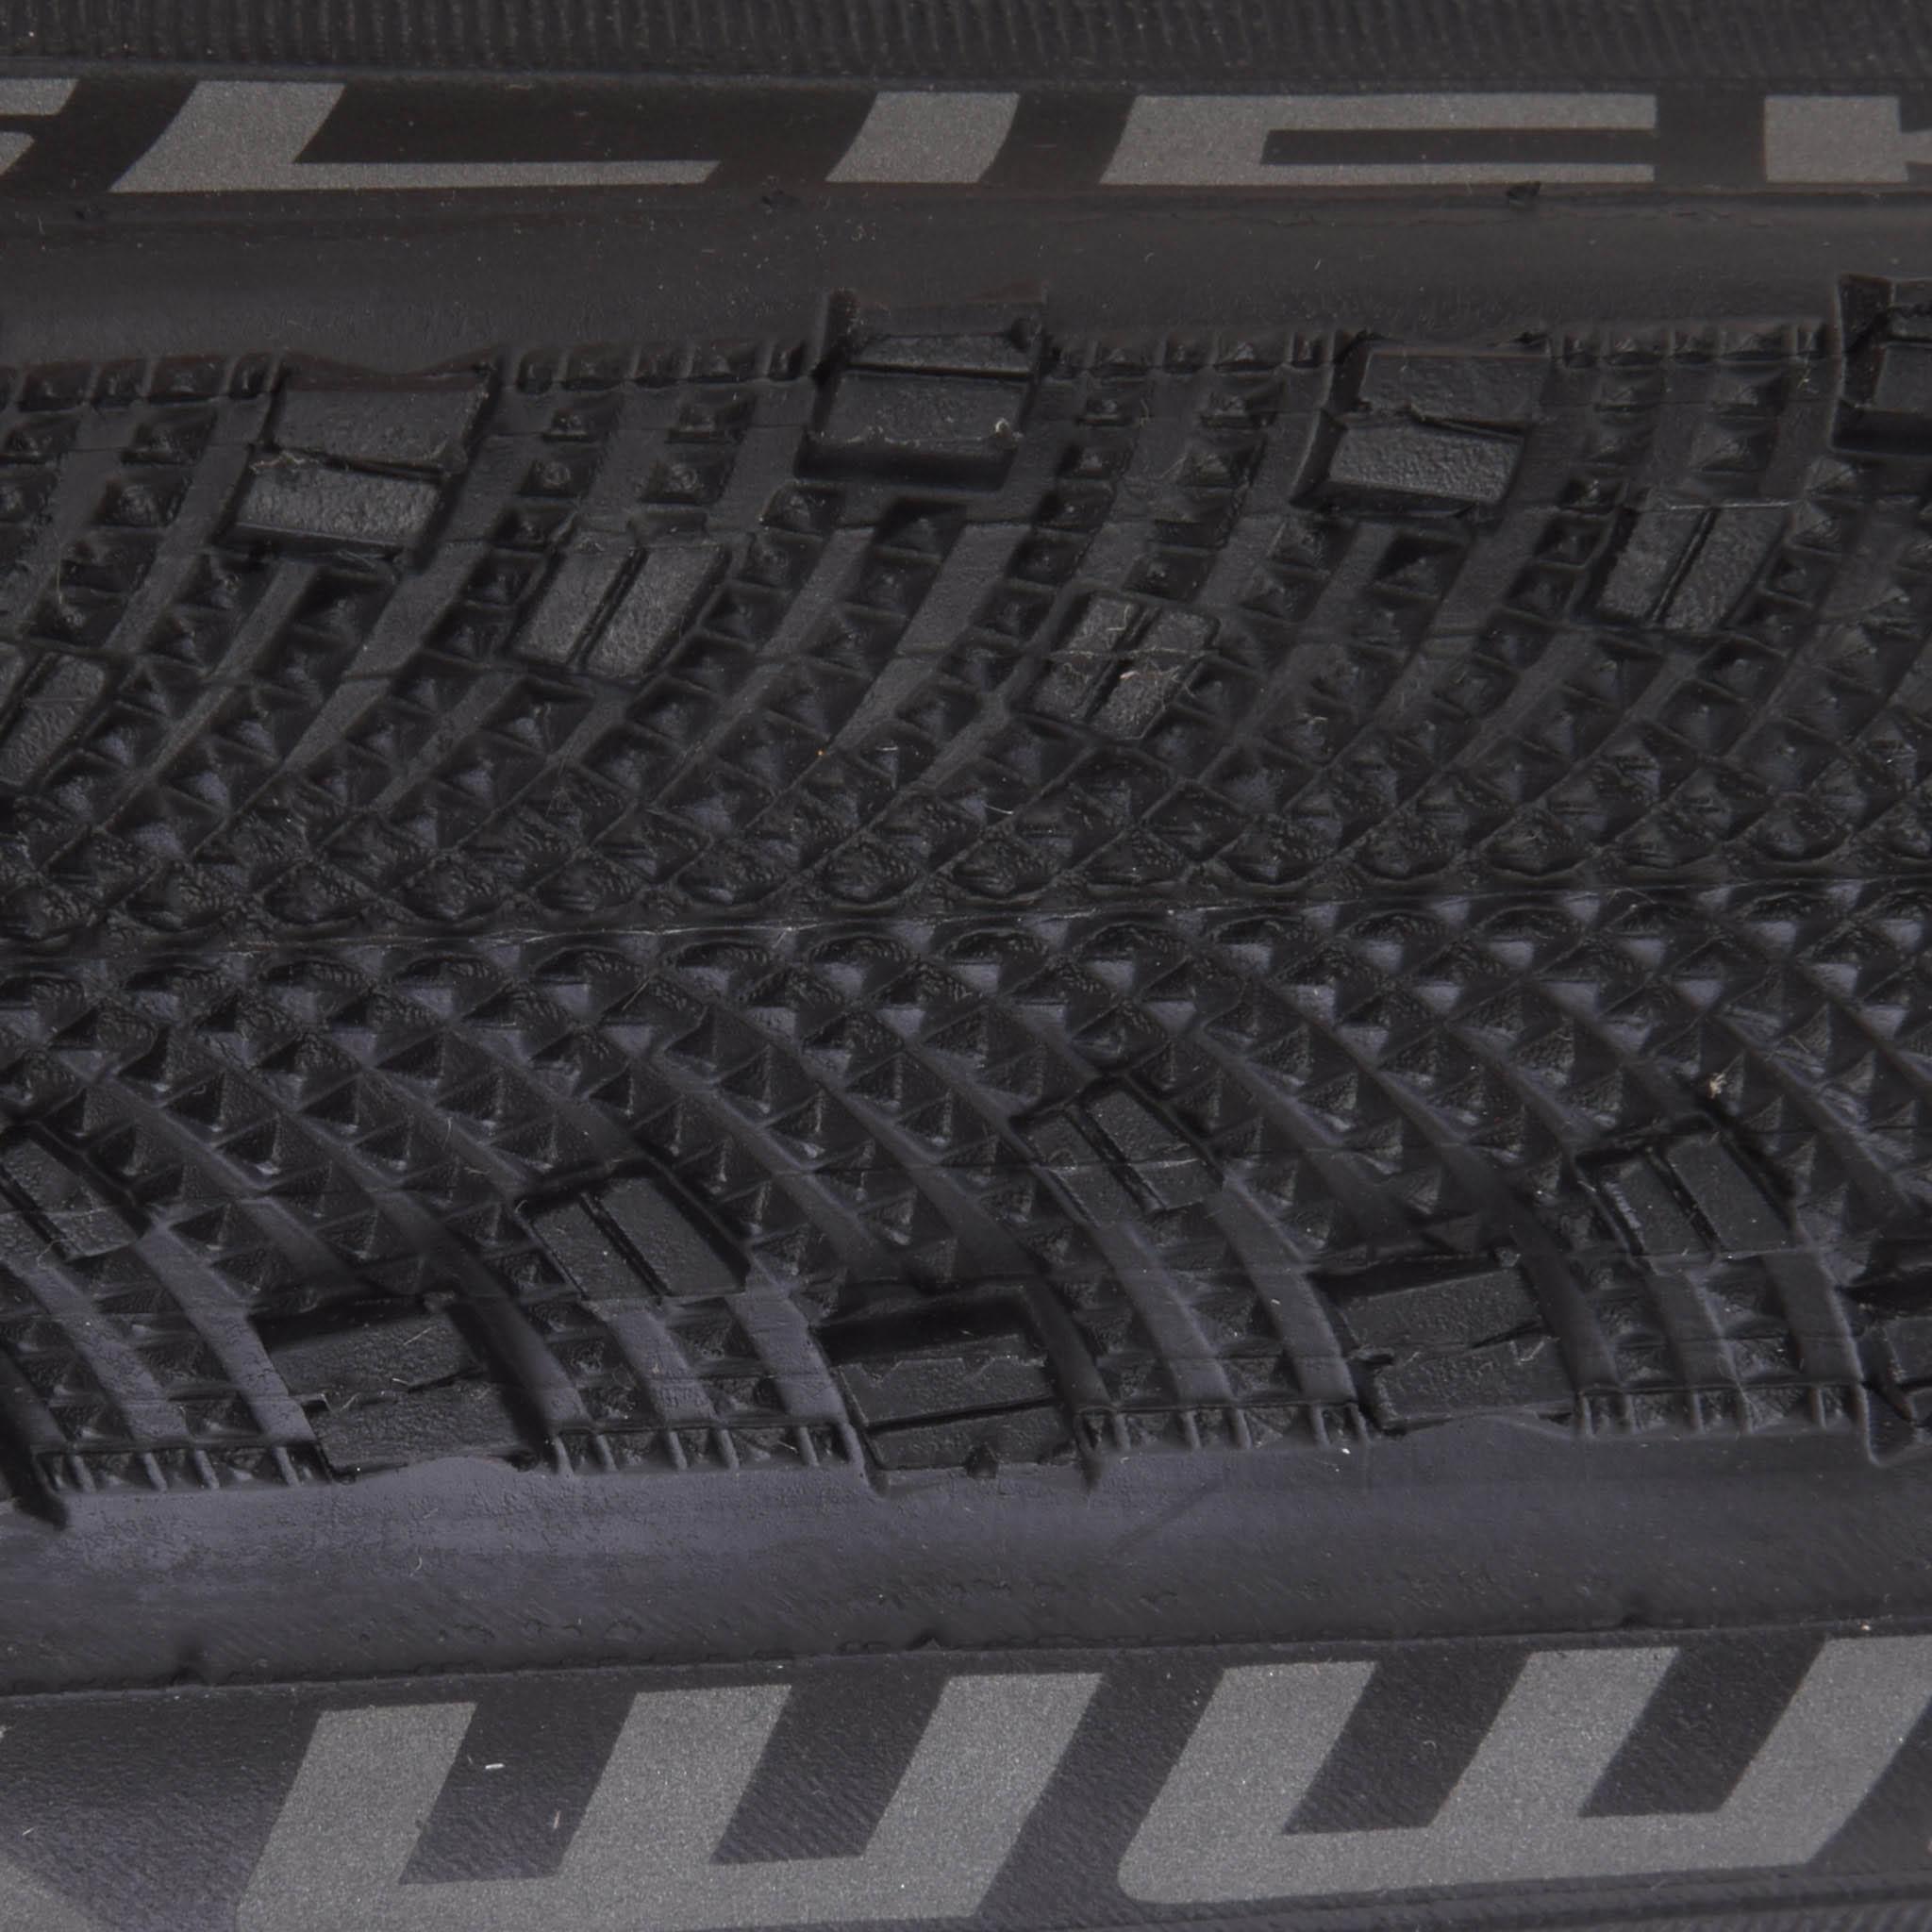 Pneu schwalbe sammy slick cx 700x35c souple probikeshop for 700x35c chambre air